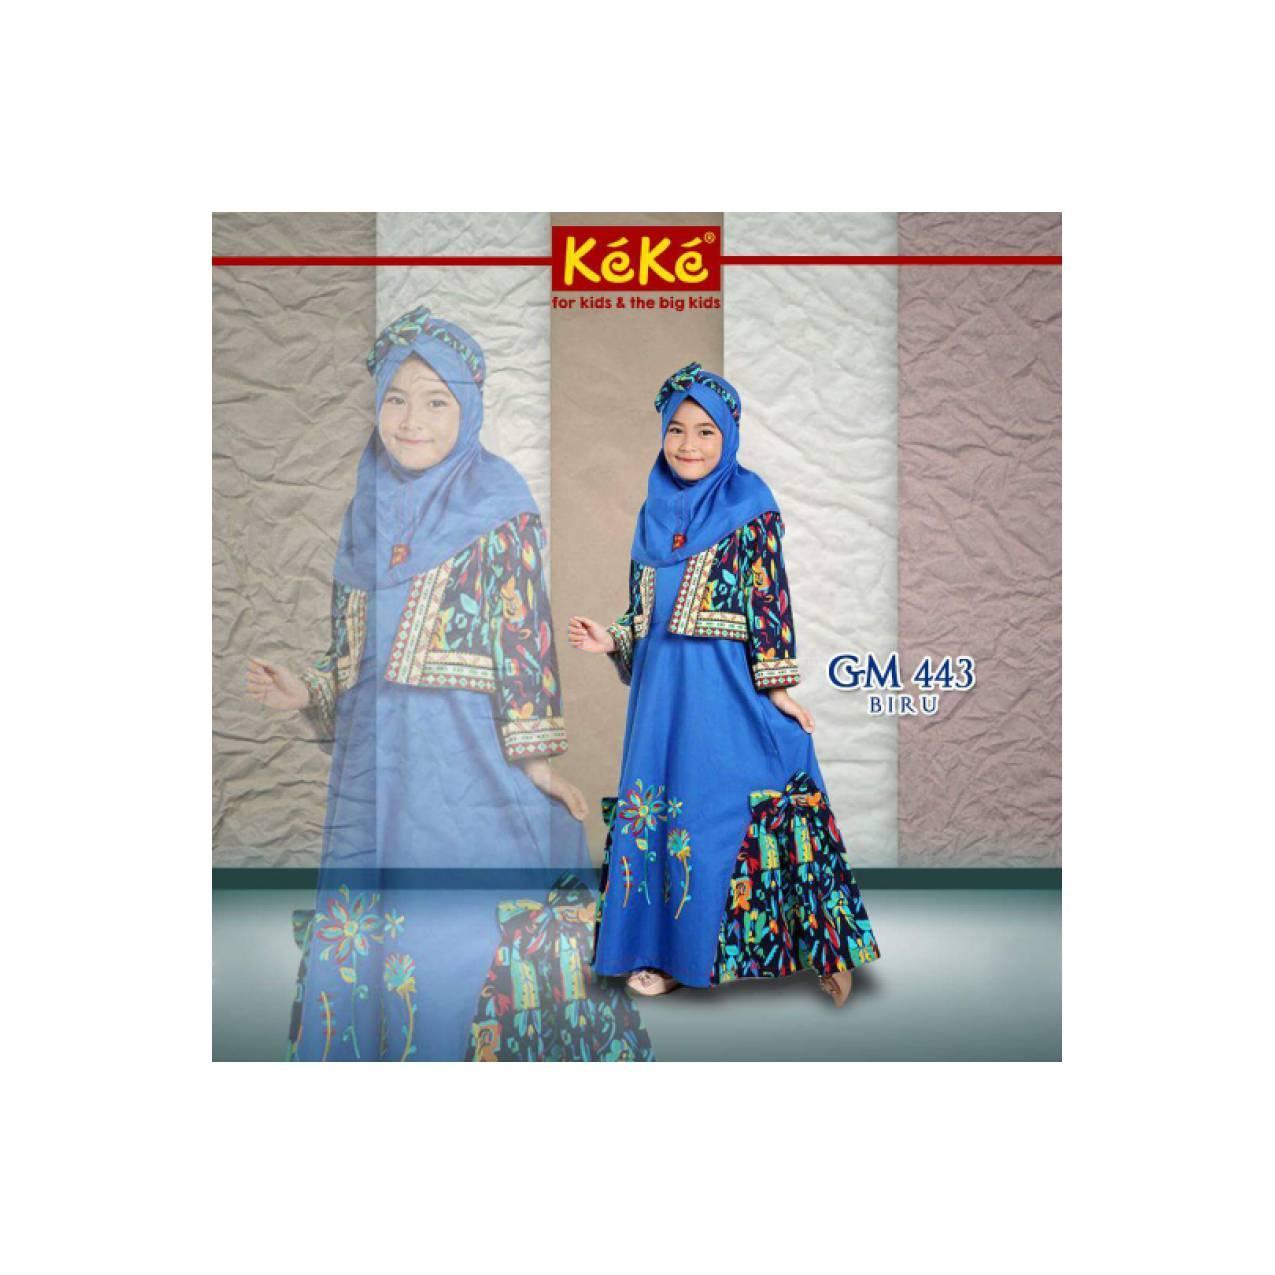 Gamis Anak merk Keke Ukuran 12 diskon 20{55e037da9a70d2f692182bf73e9ad7c46940d20c7297ef2687c837f7bdb7b002}